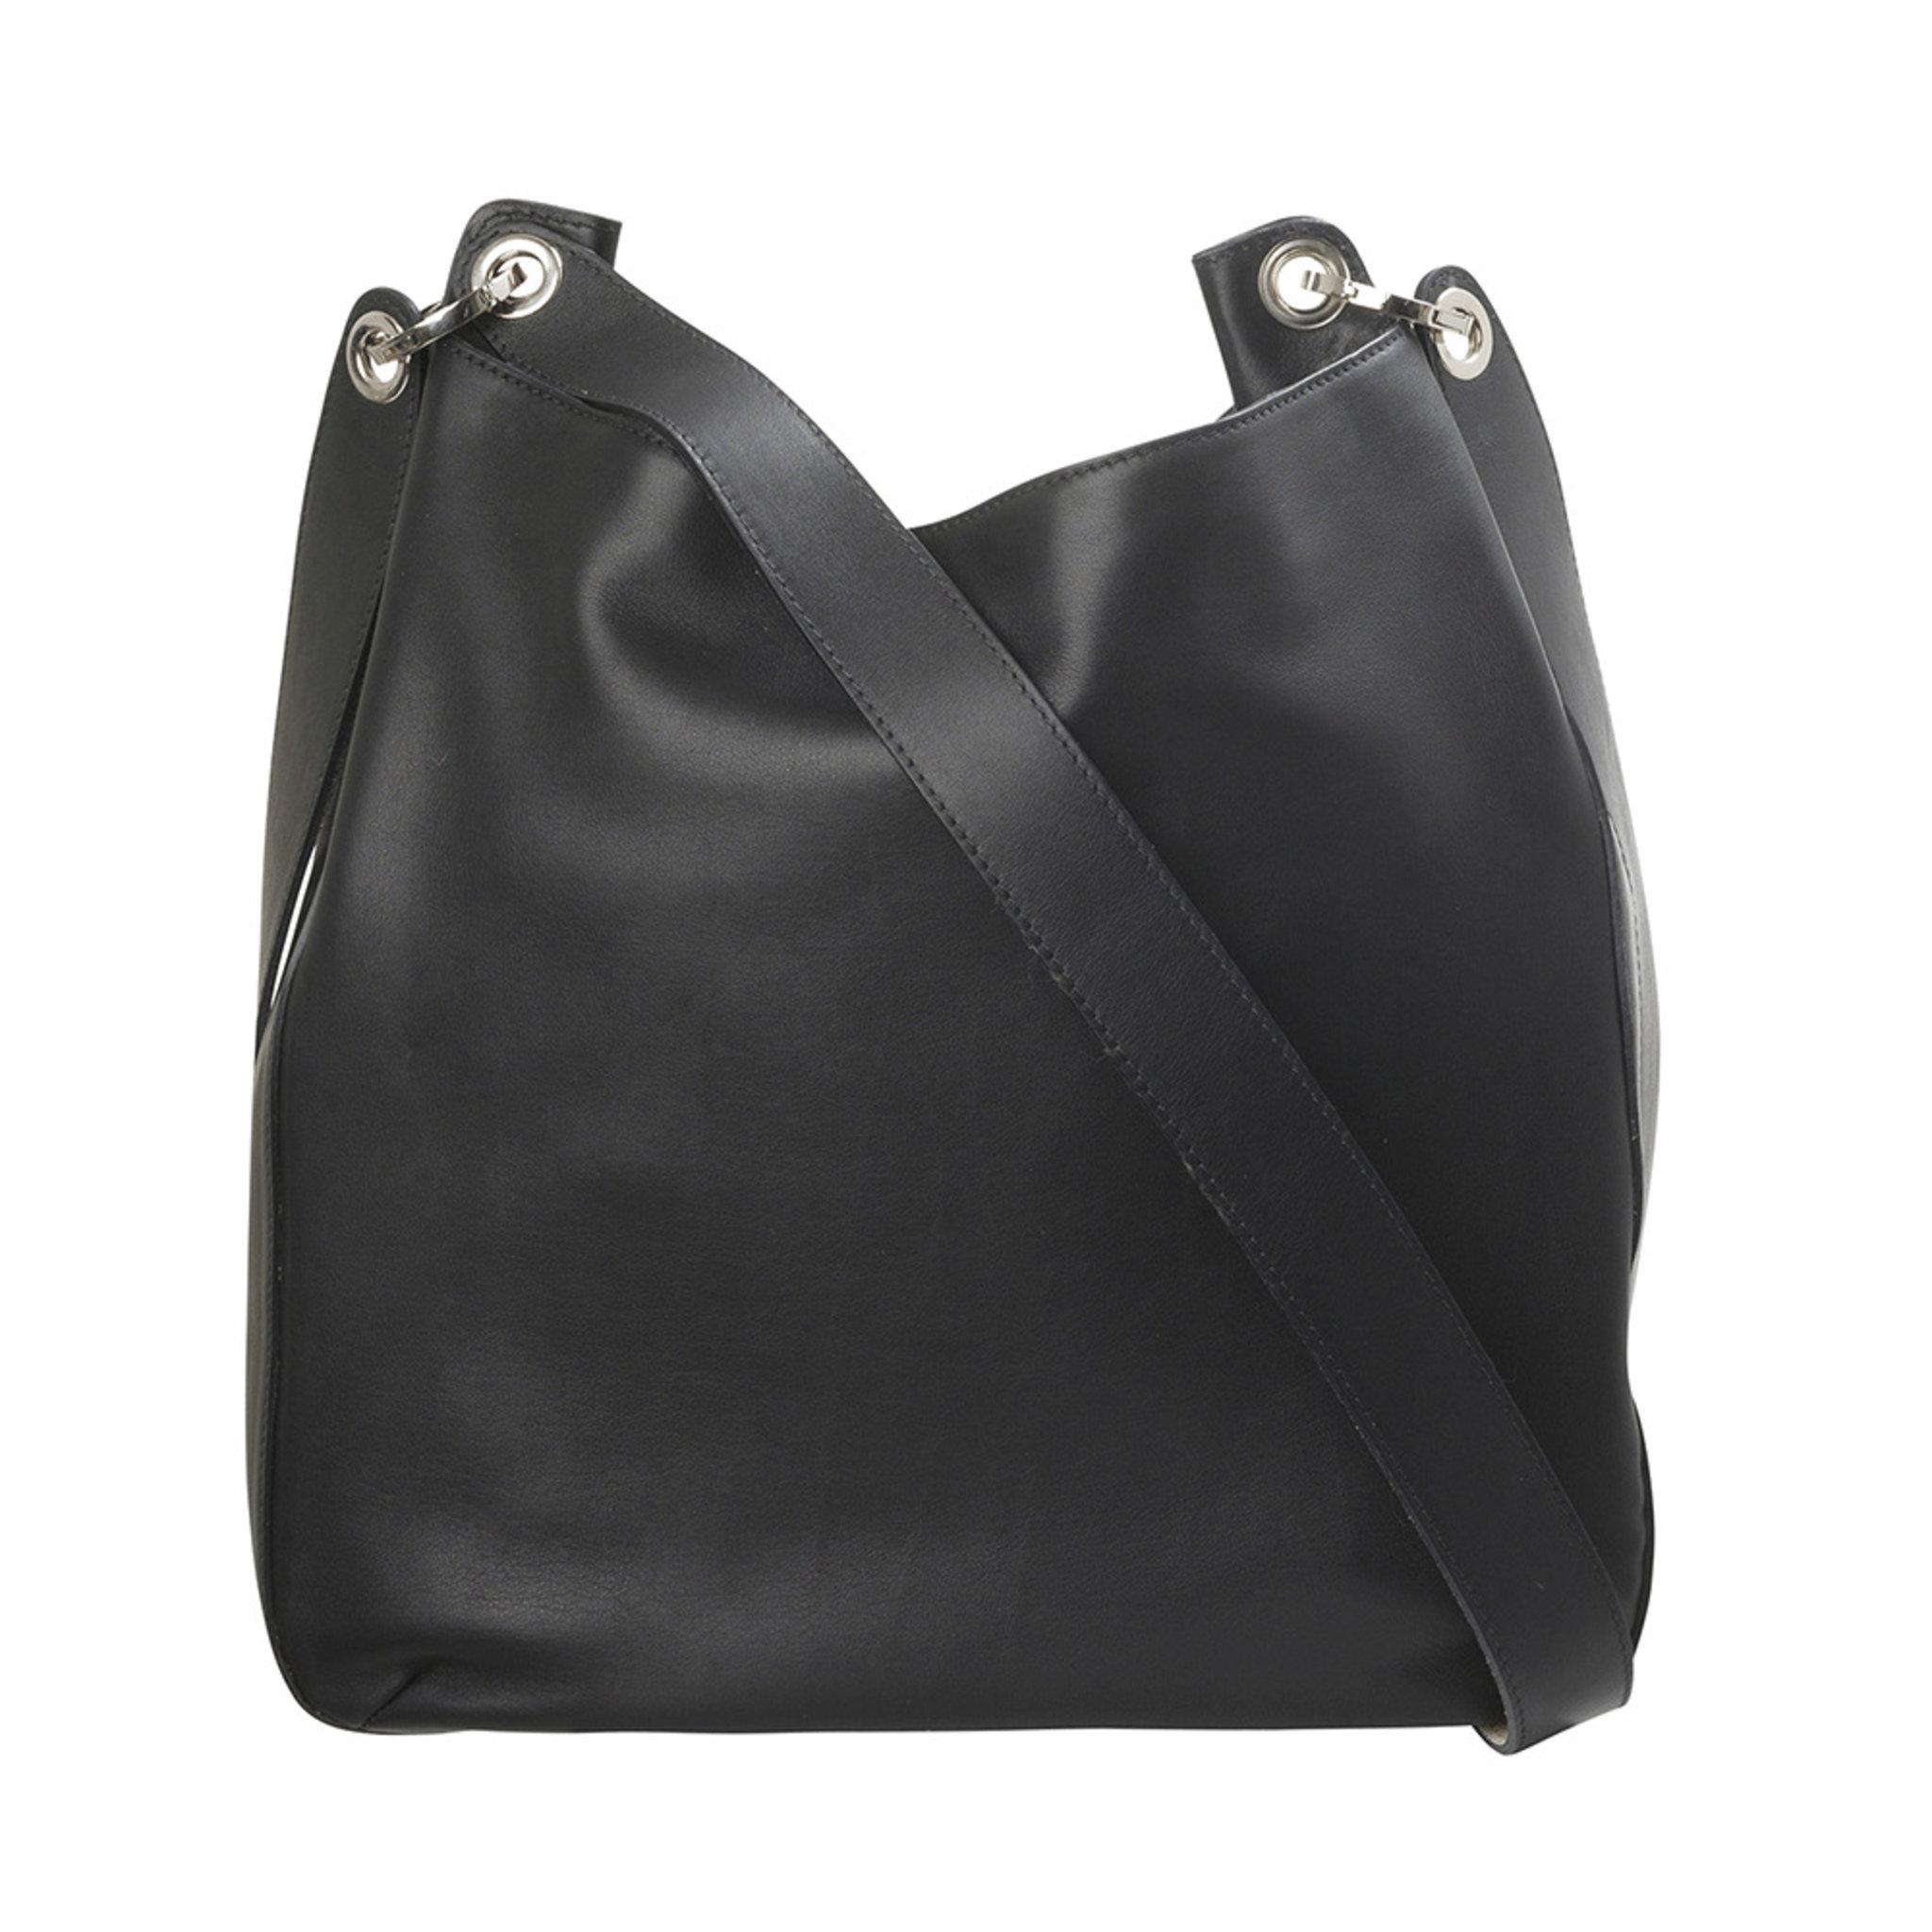 f542864f0c4d Ona Shopper - Handväskor - Köp online på åhlens.se!